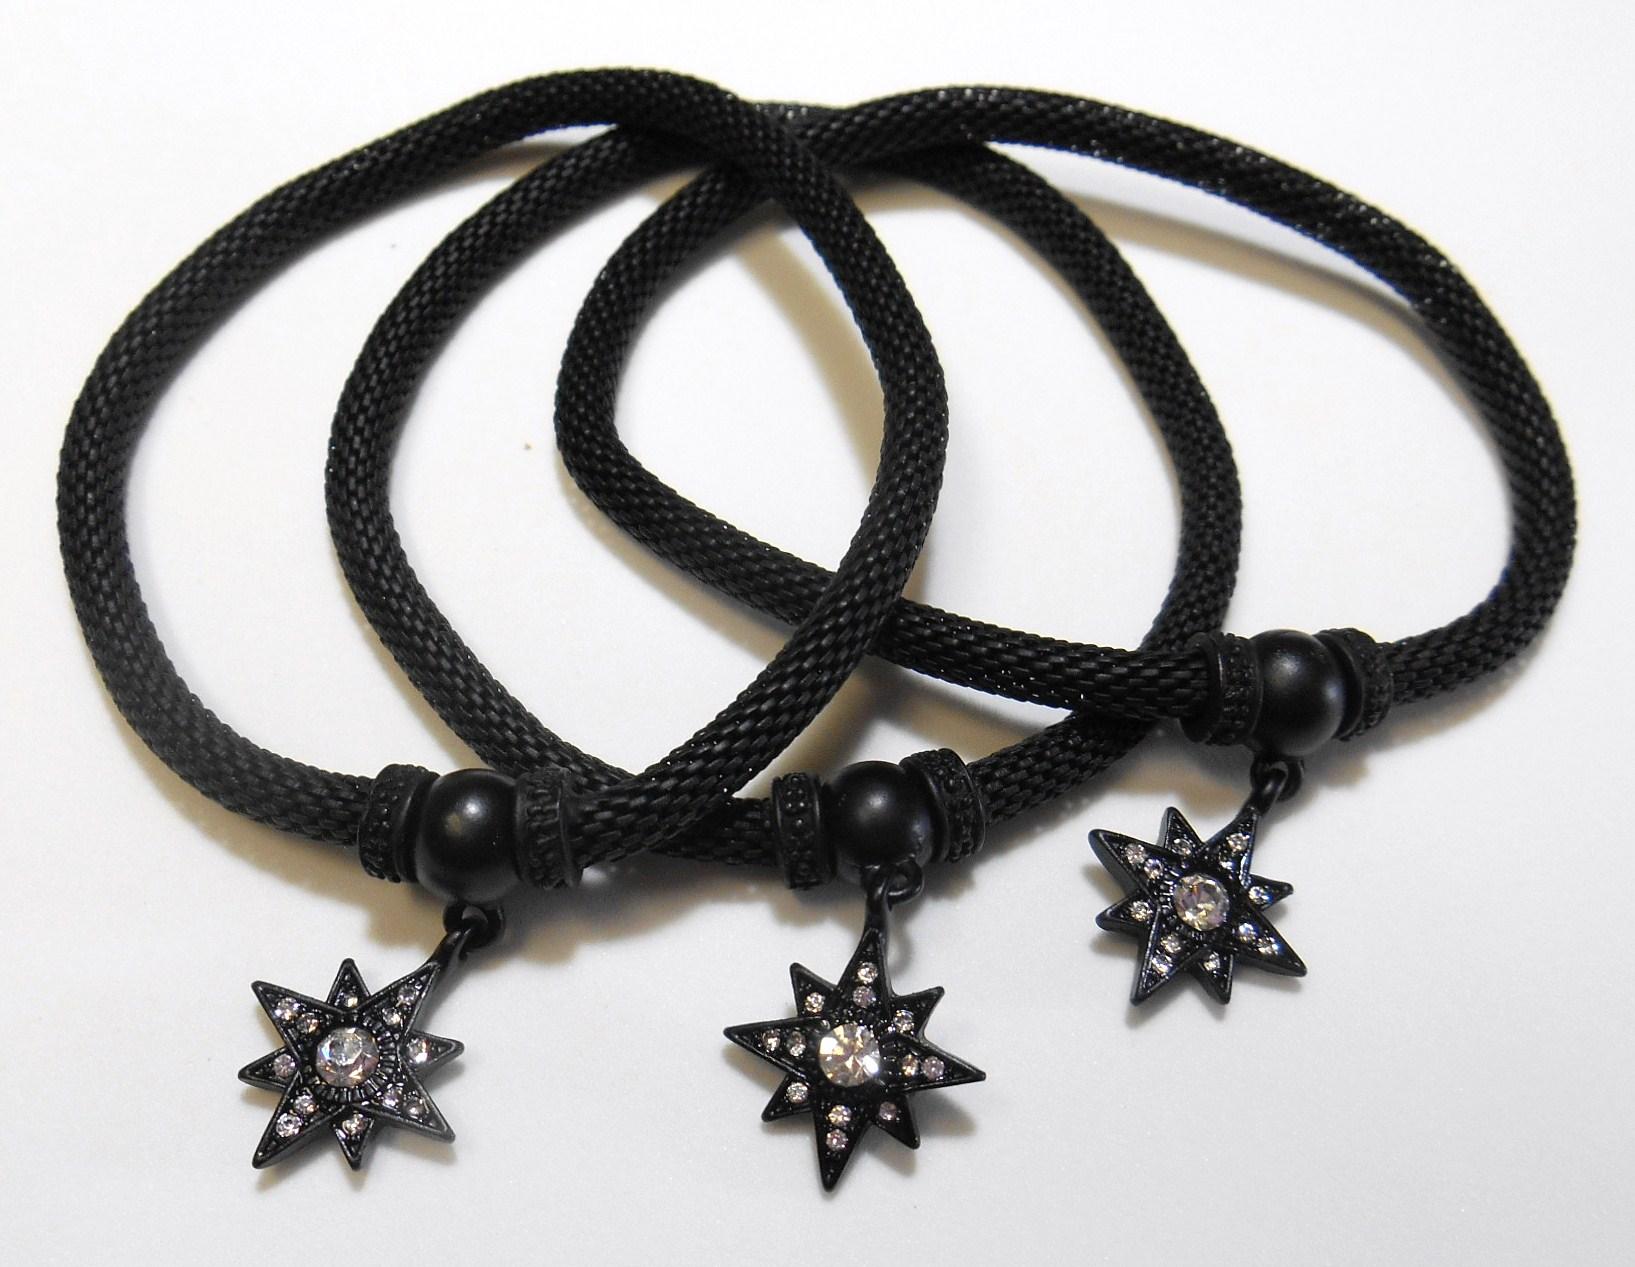 Image 2 of Black Star Charm Bracelet Set